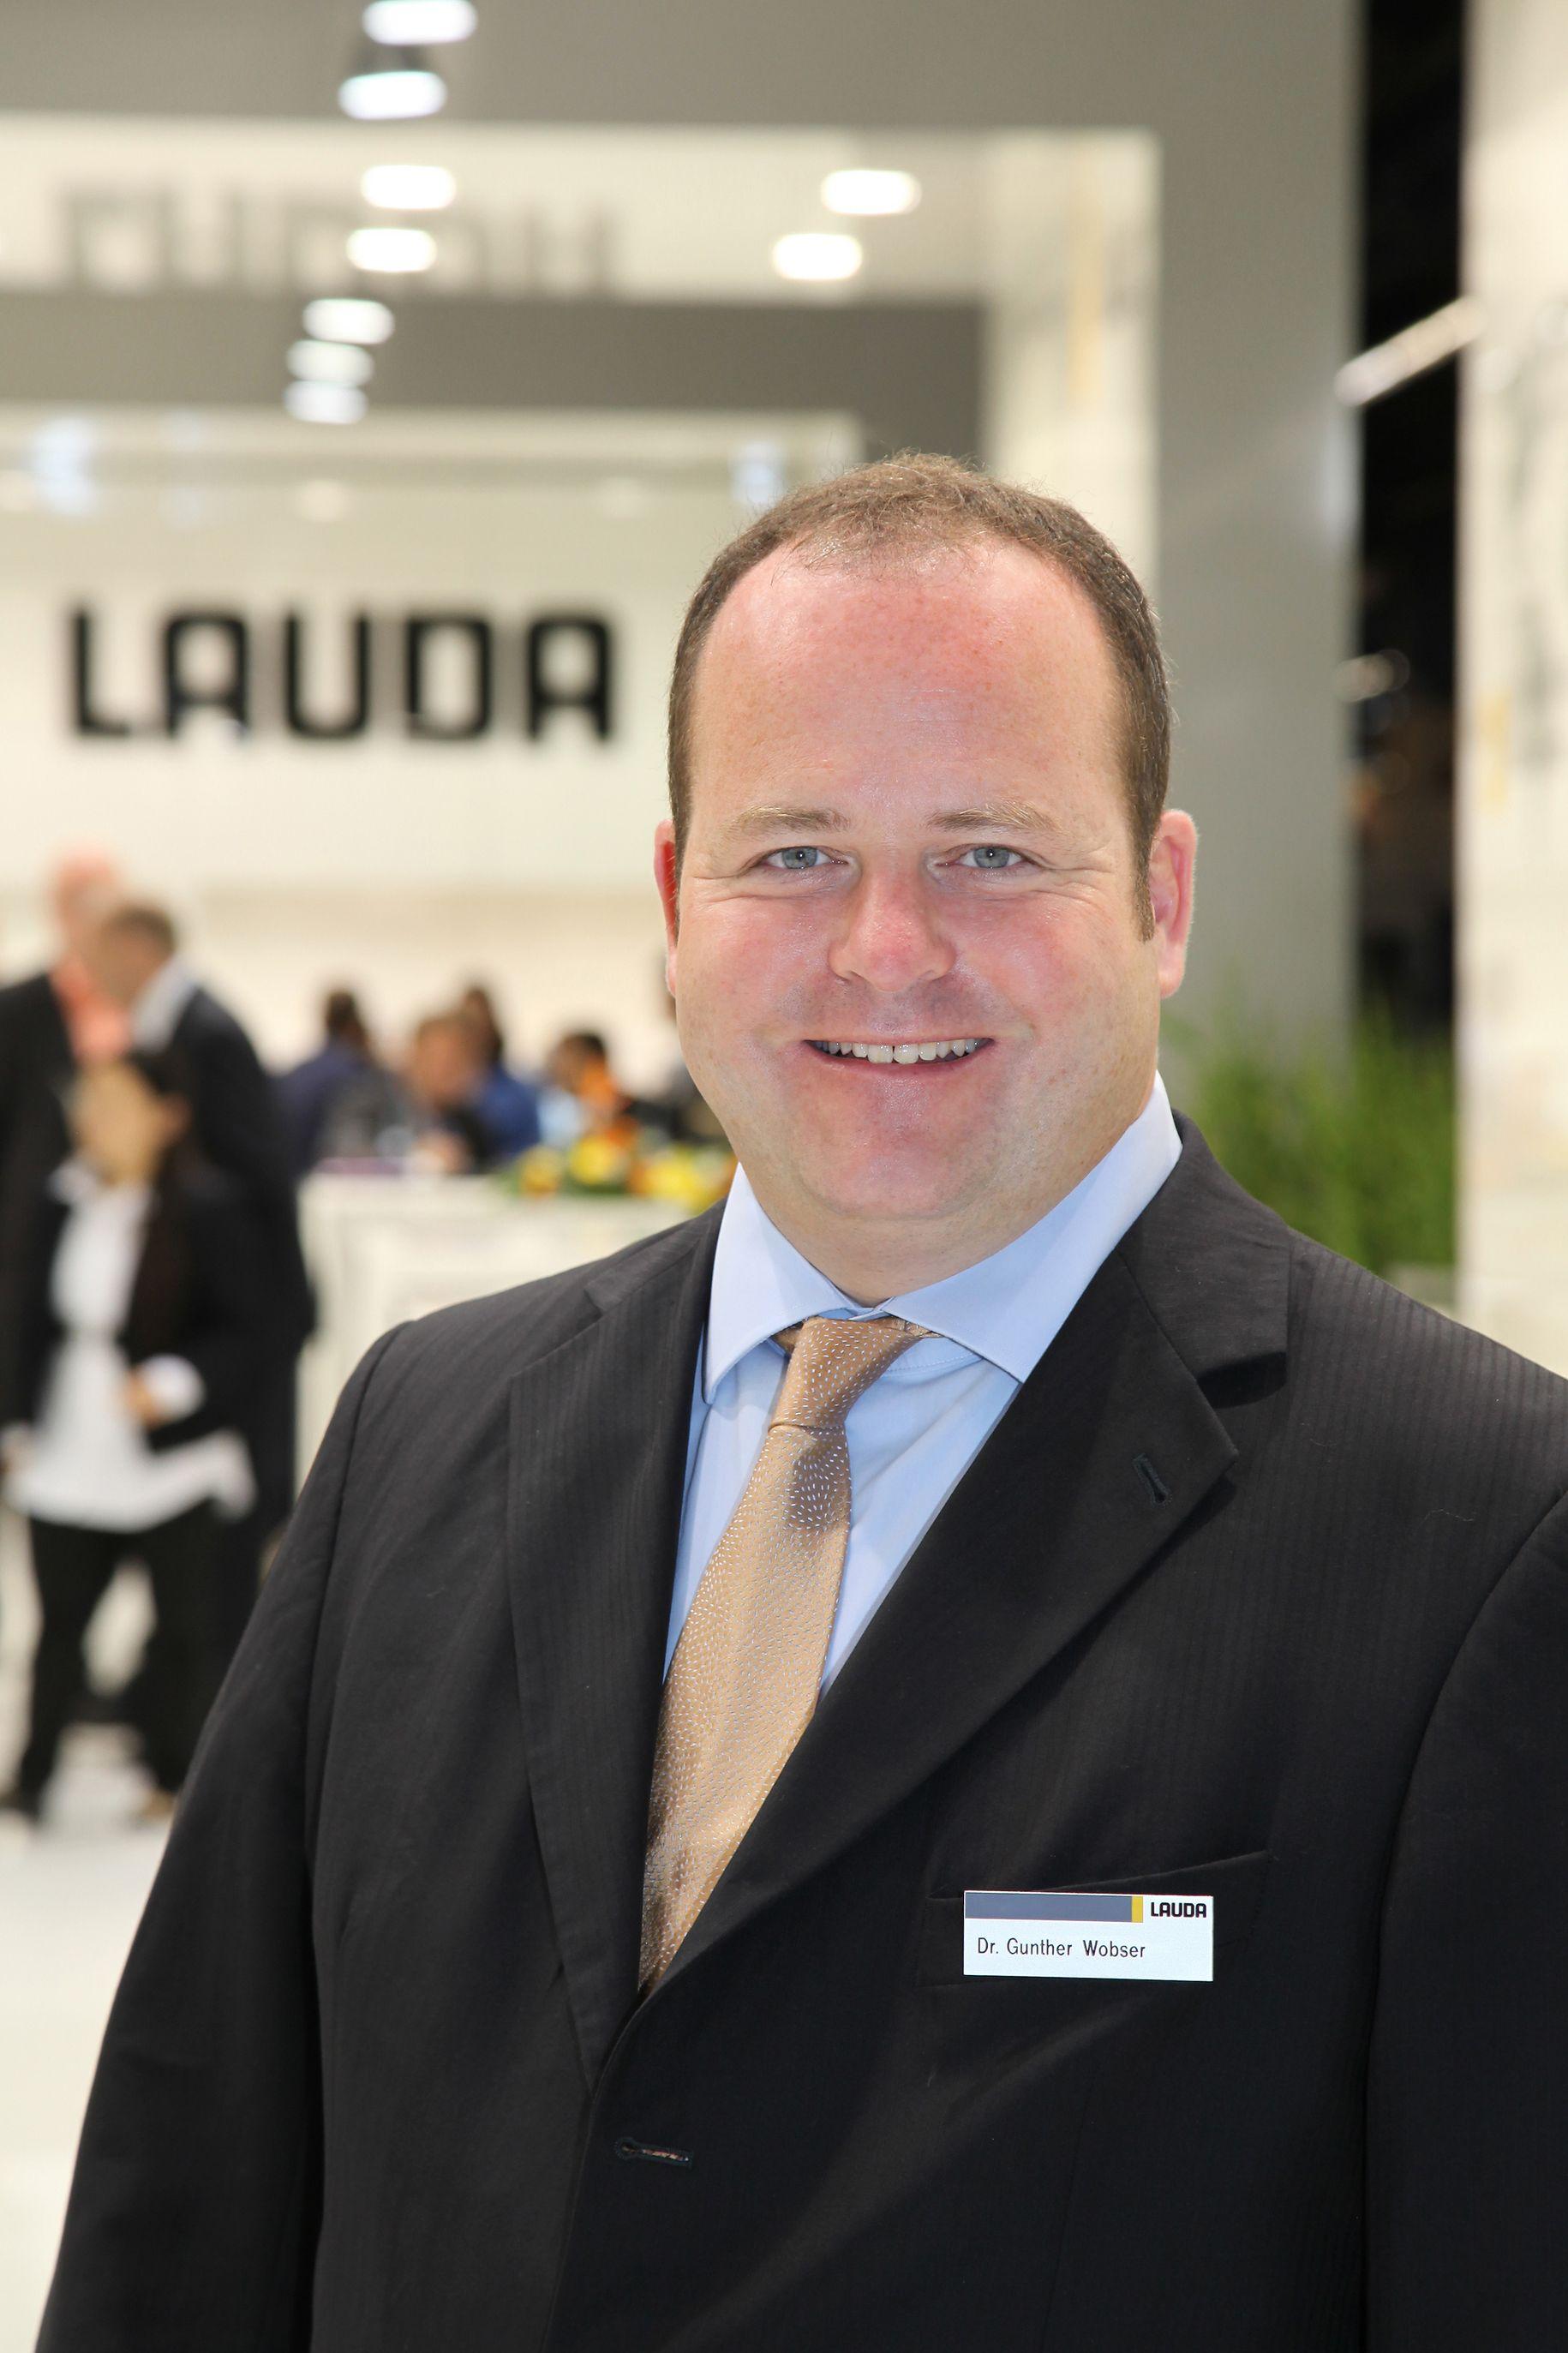 Dr. Gunther Wobser, Geschäftsführender Gesellschafter LAUDA DR. R. WOBSER GMBH & CO. KG